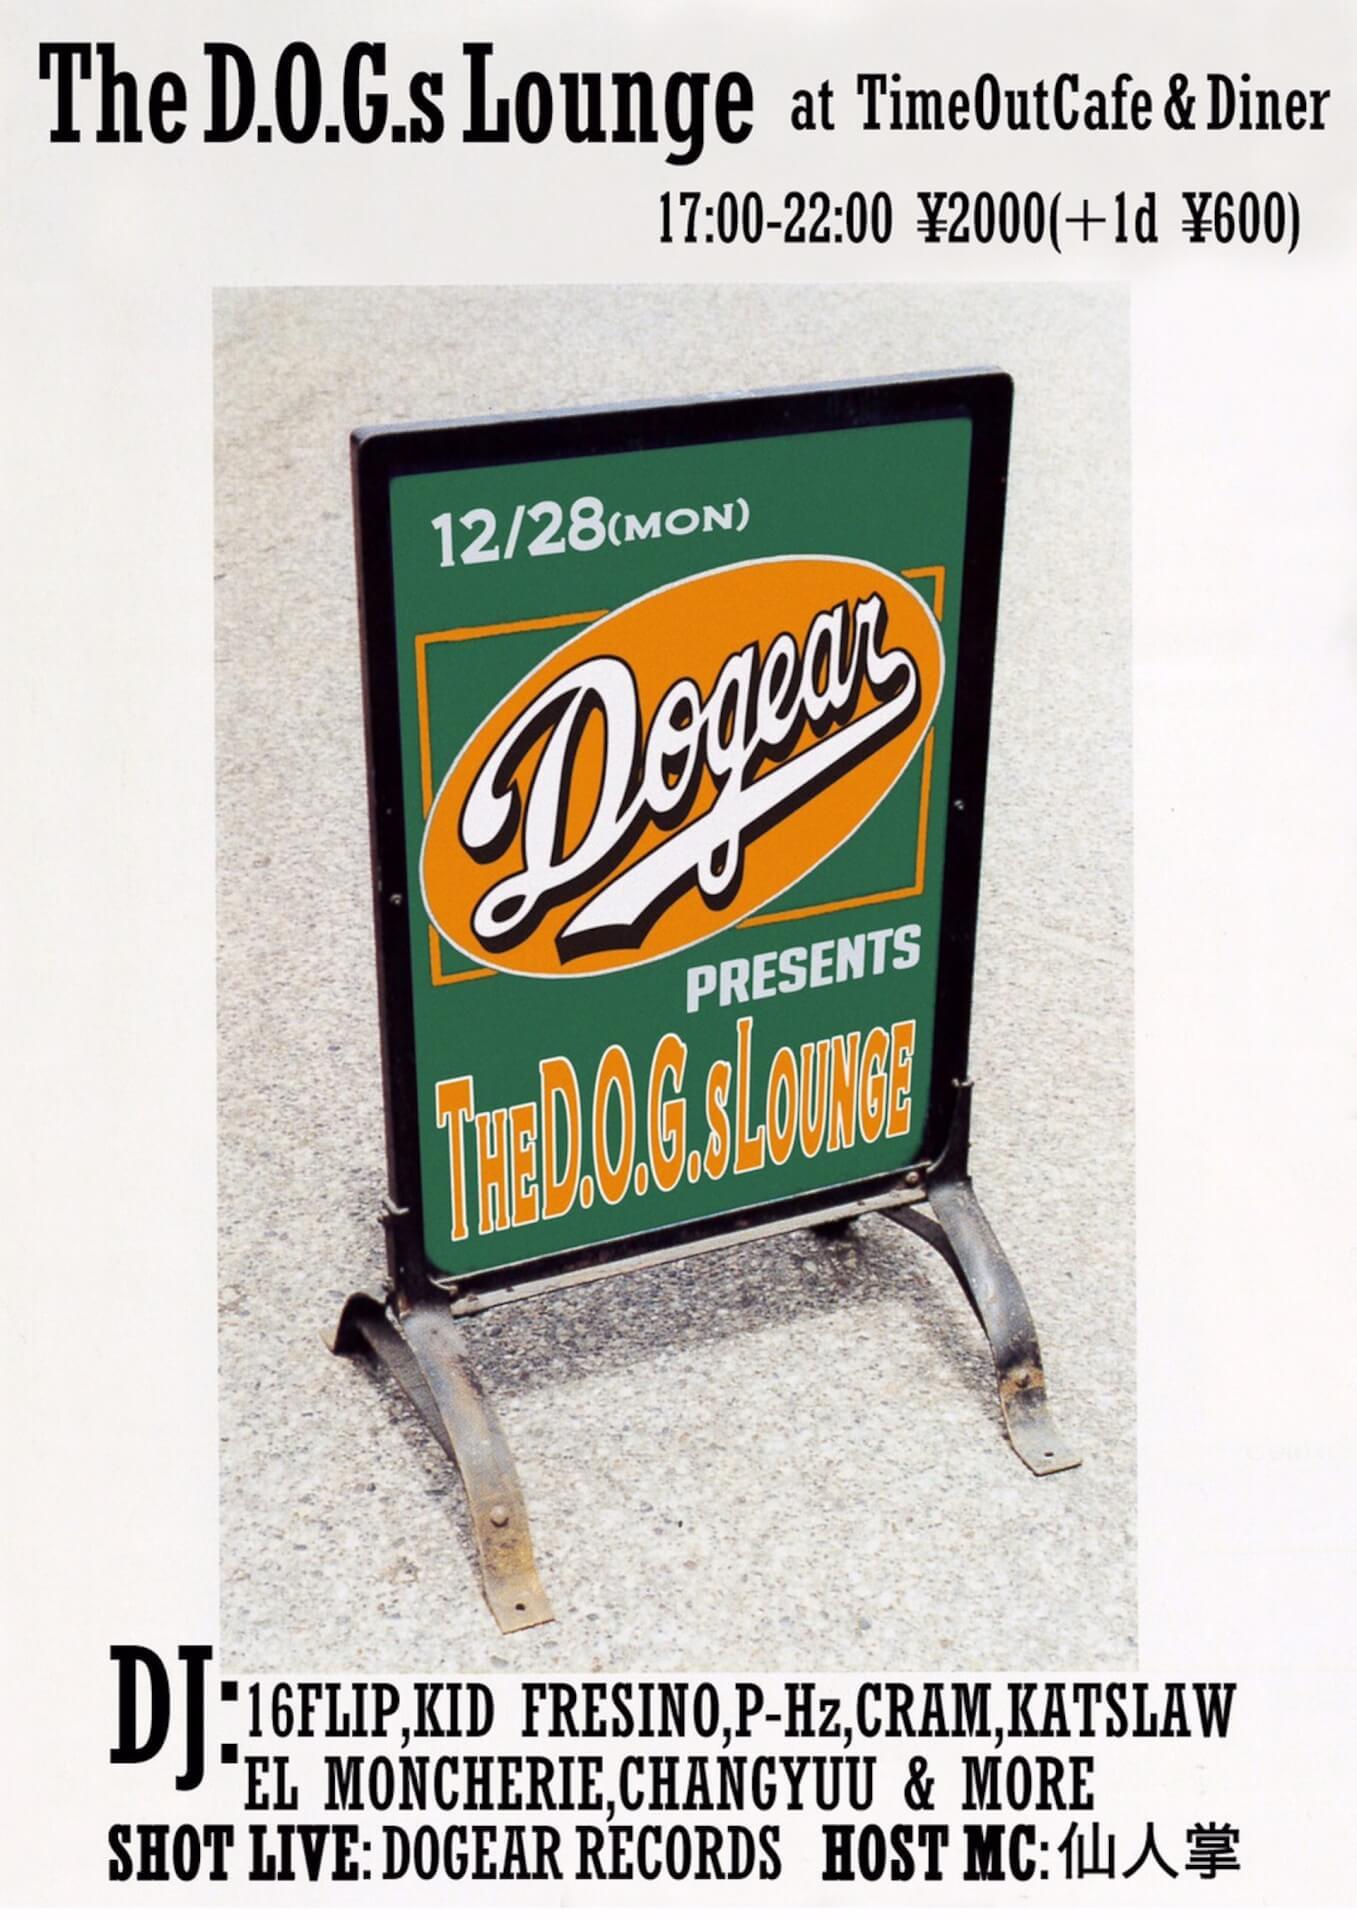 〈Dogear Records〉主催のパーティー<The D.O.G.s Lounge>が開催決定!16FLIP、KID FRESINO、仙人掌らが出演 music201221_dogslounge